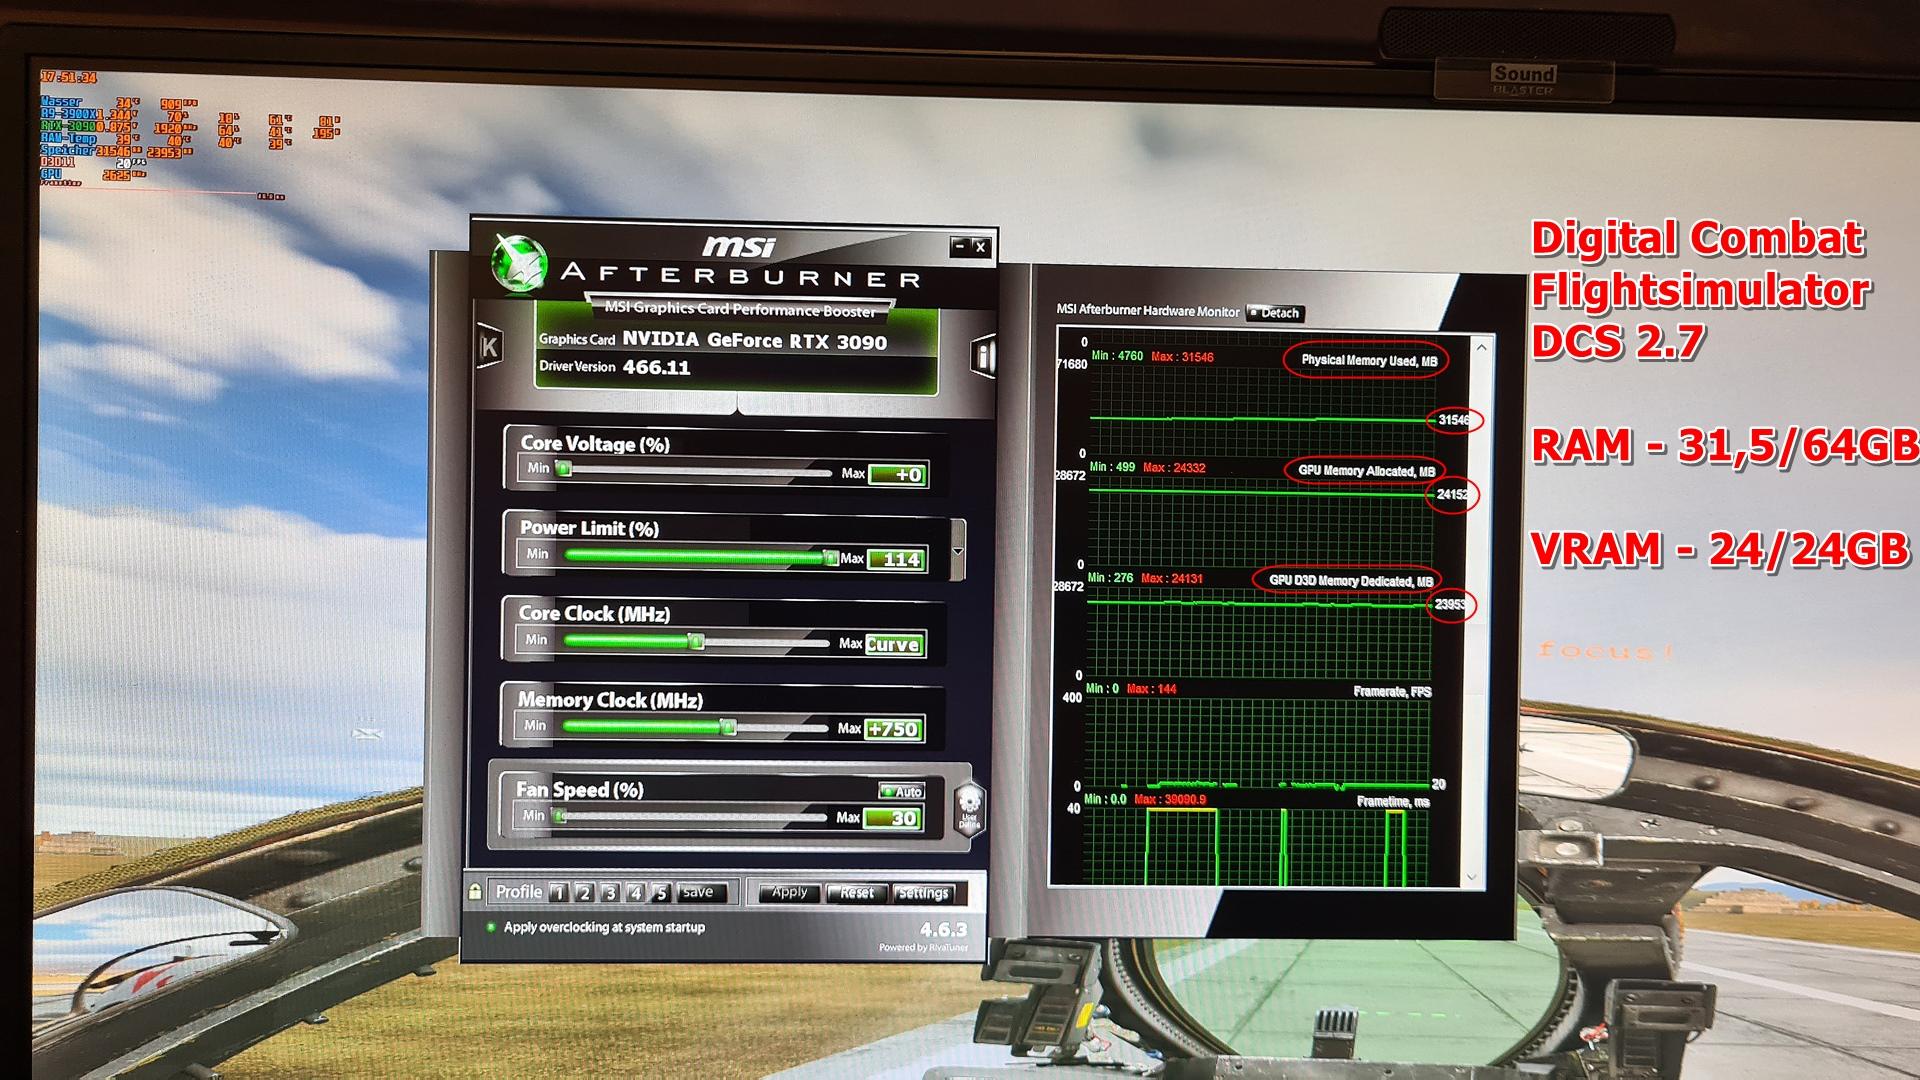 DCS 2.7 VRAM and RAM usage.jpg